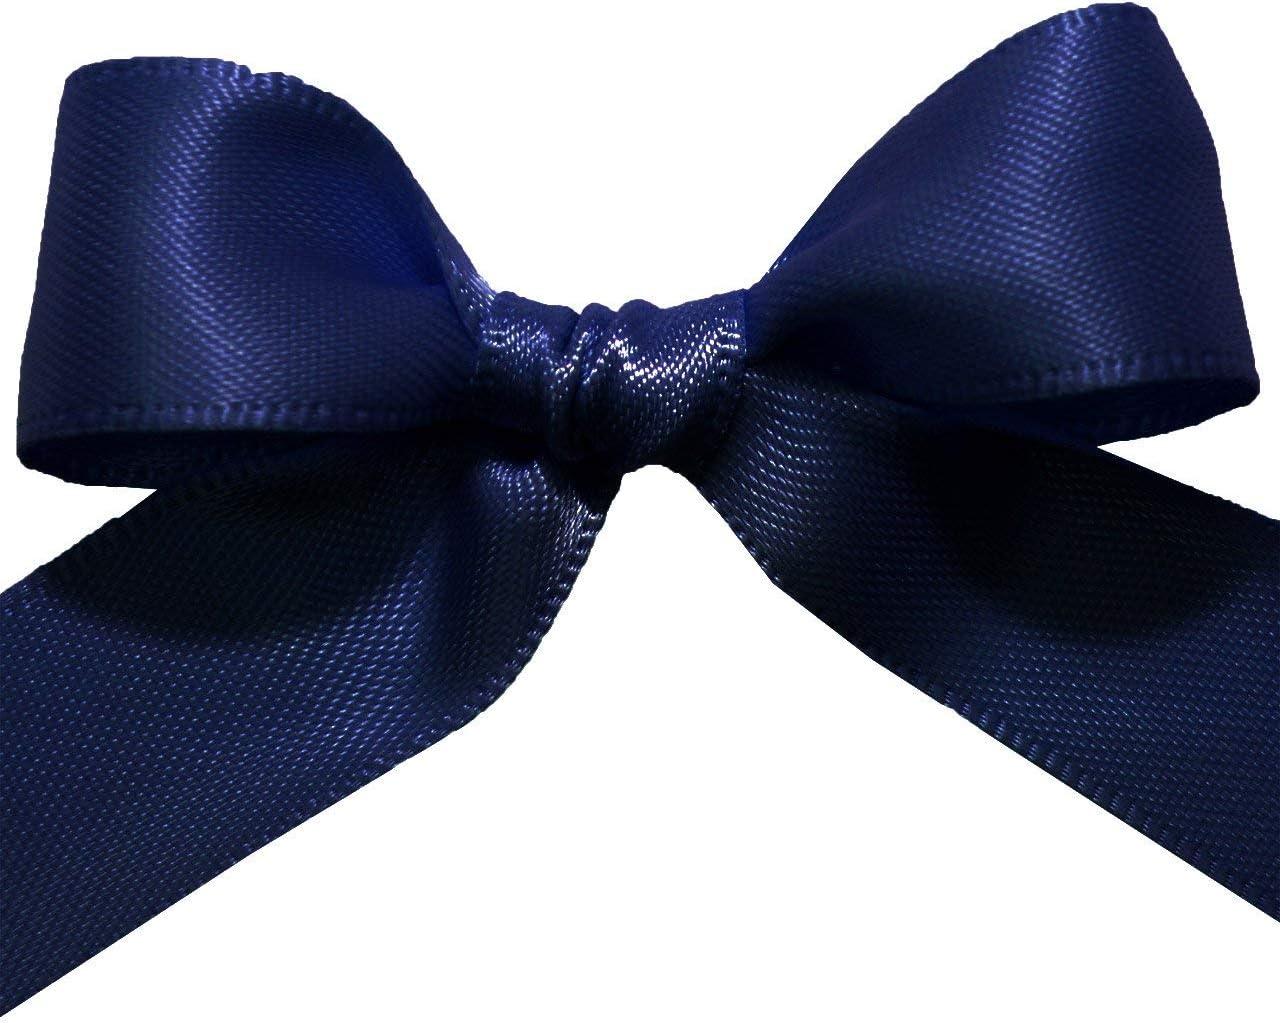 3//8x 50 Yd Morex Ribbon 08816//50-327 Double Face Satin Ribbon Aegean Blue